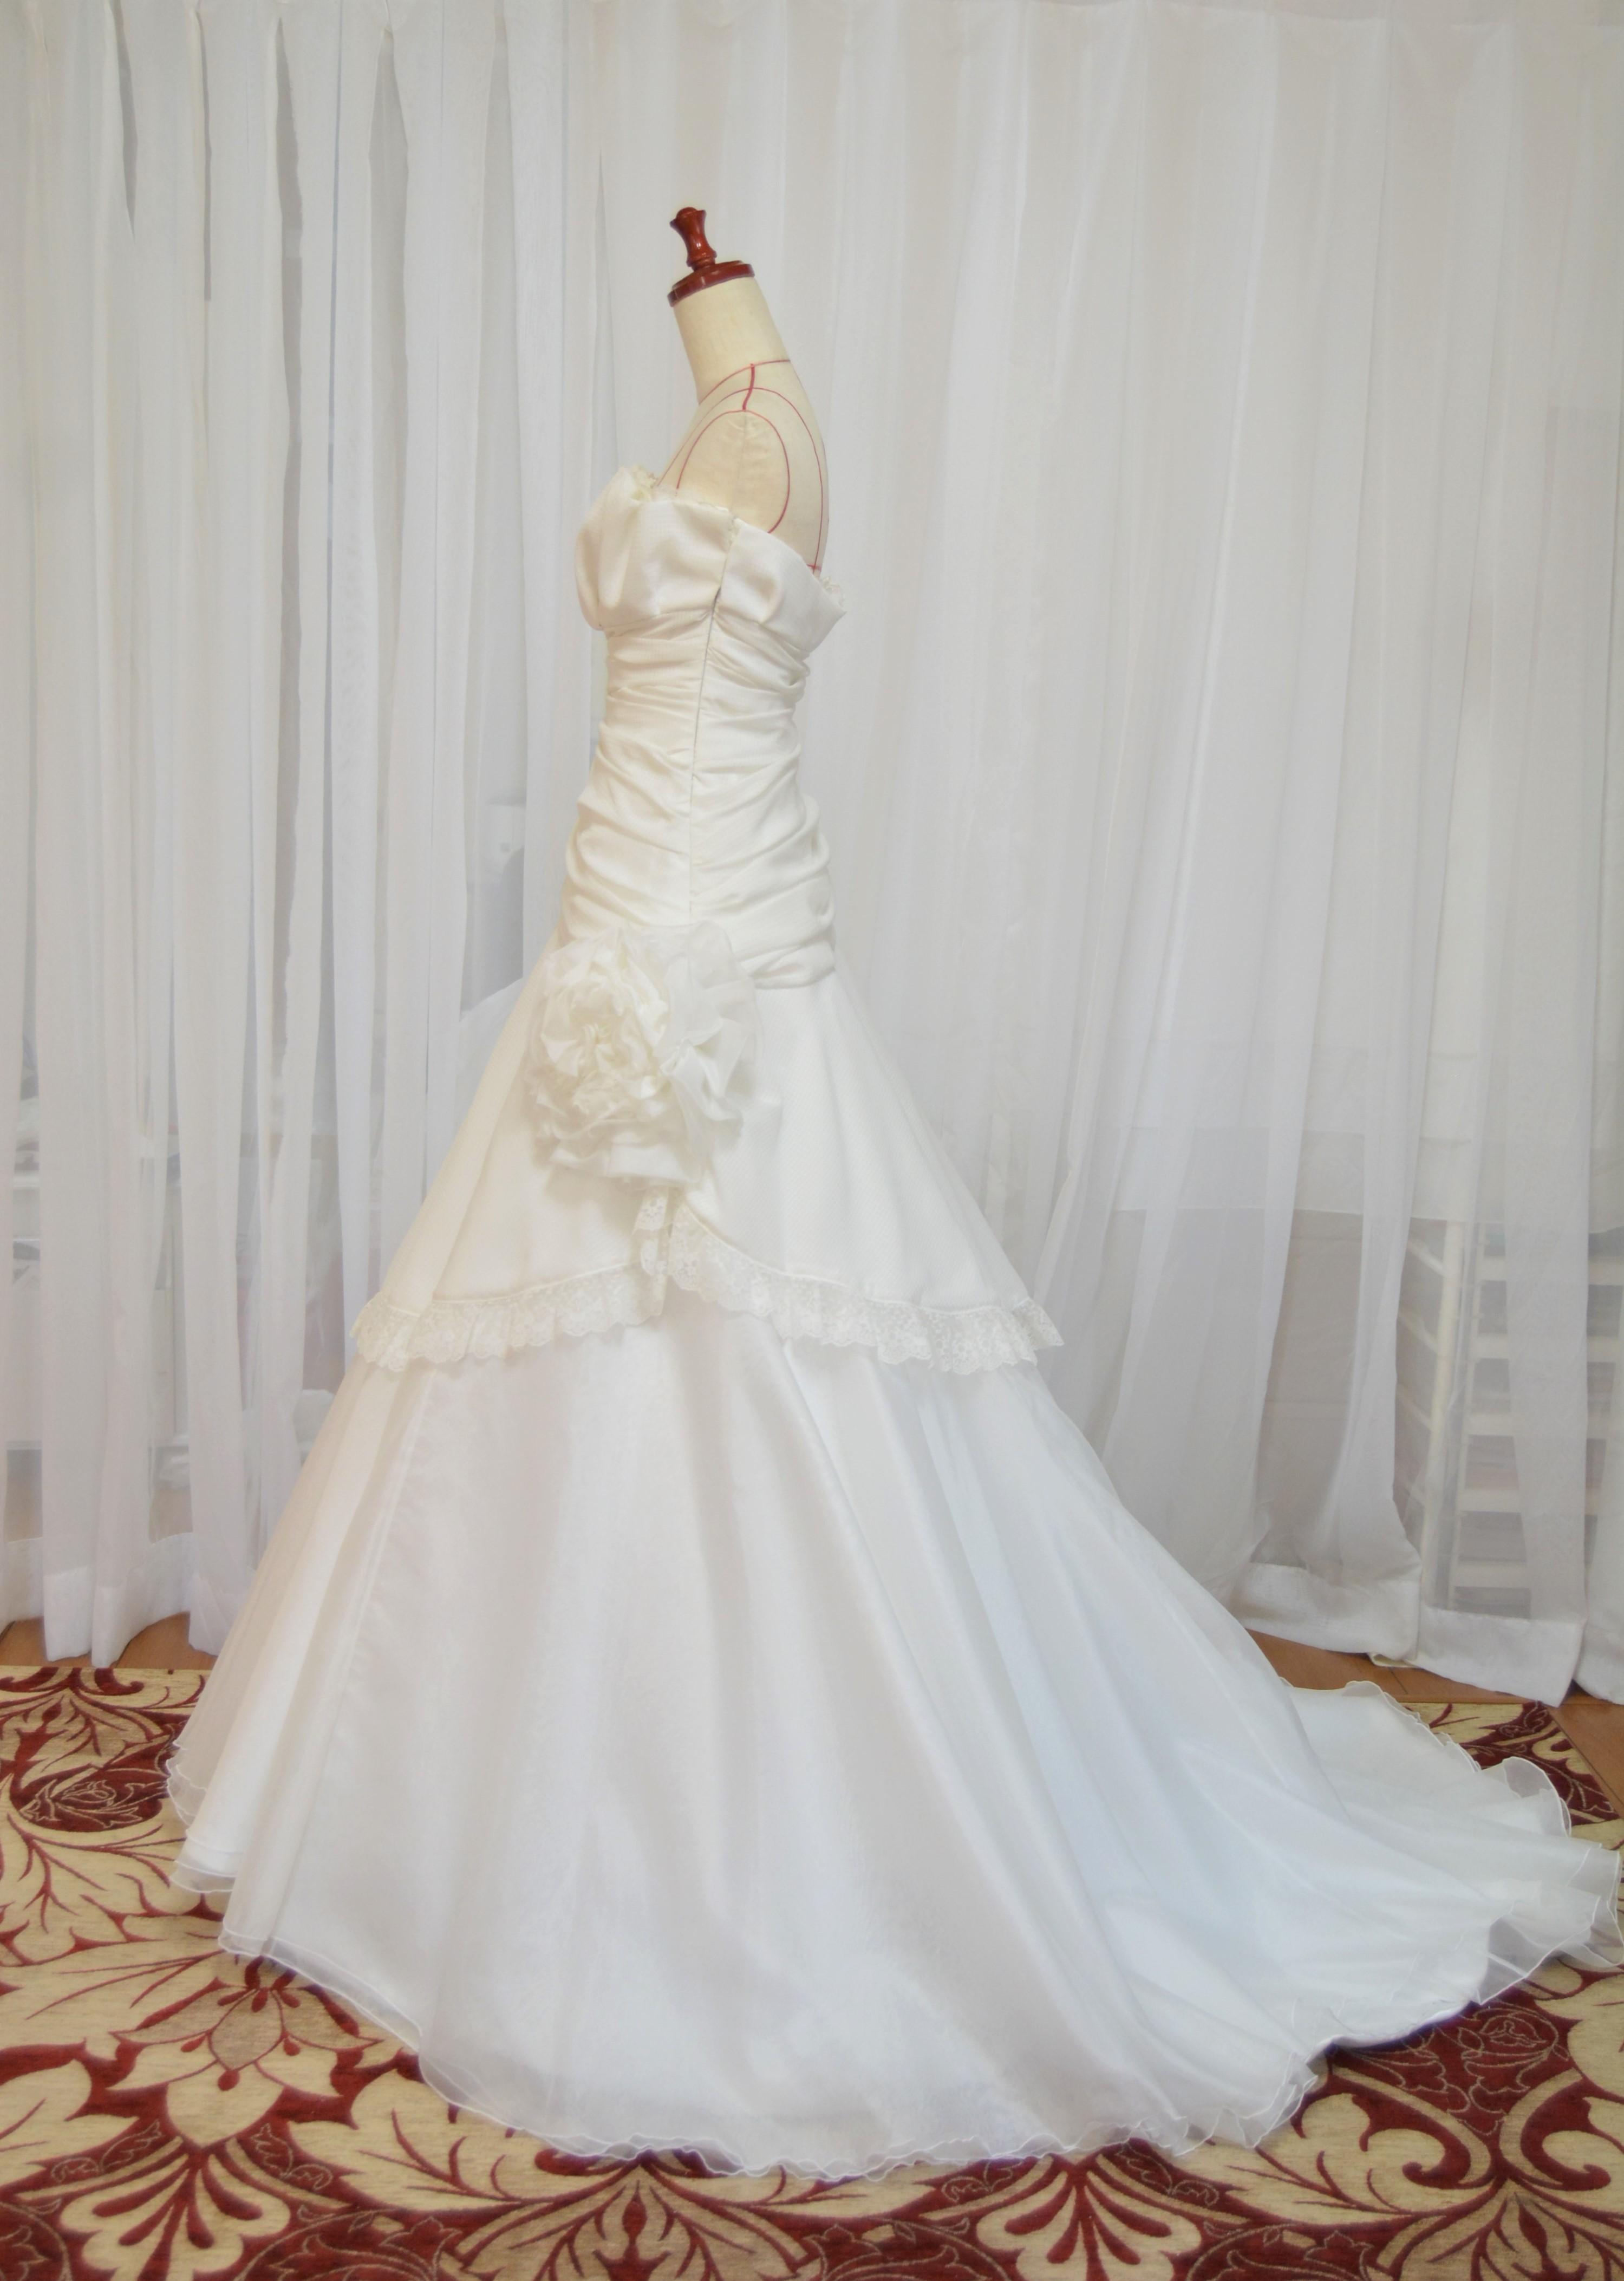 hanayomesalon  ソフトマーメイドライン ウエディングドレス